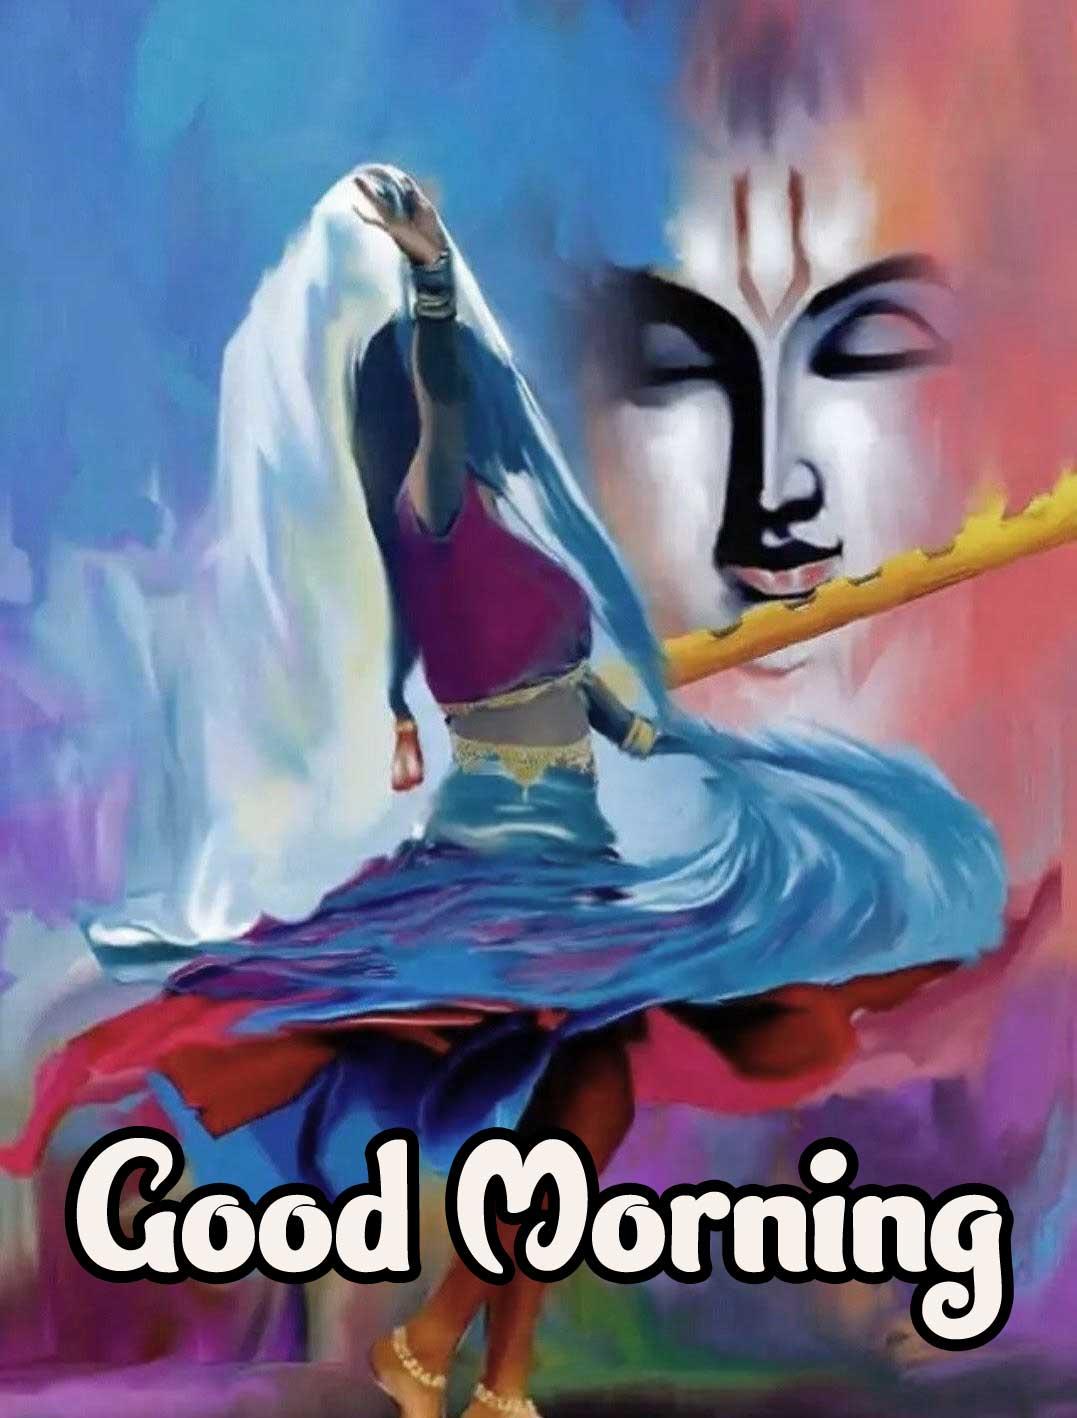 Good Morning Wallpaper Pics for Whatsapp